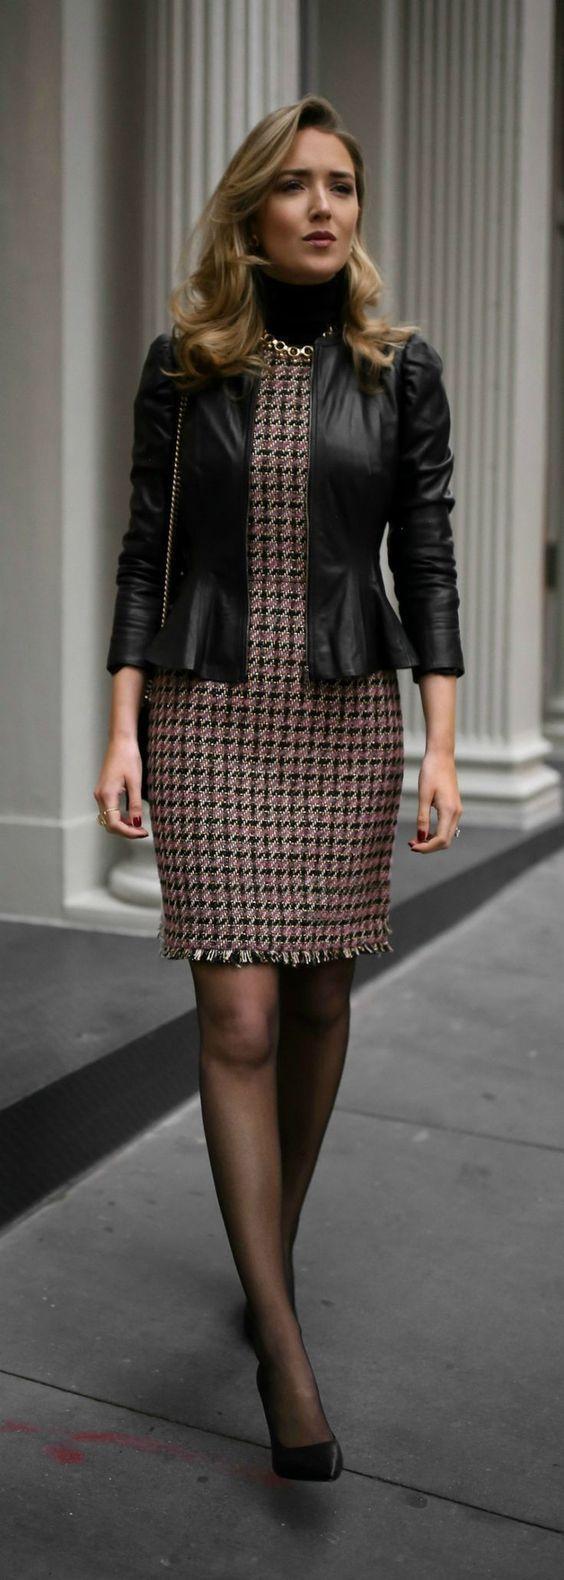 peplum ceket siyah tarz